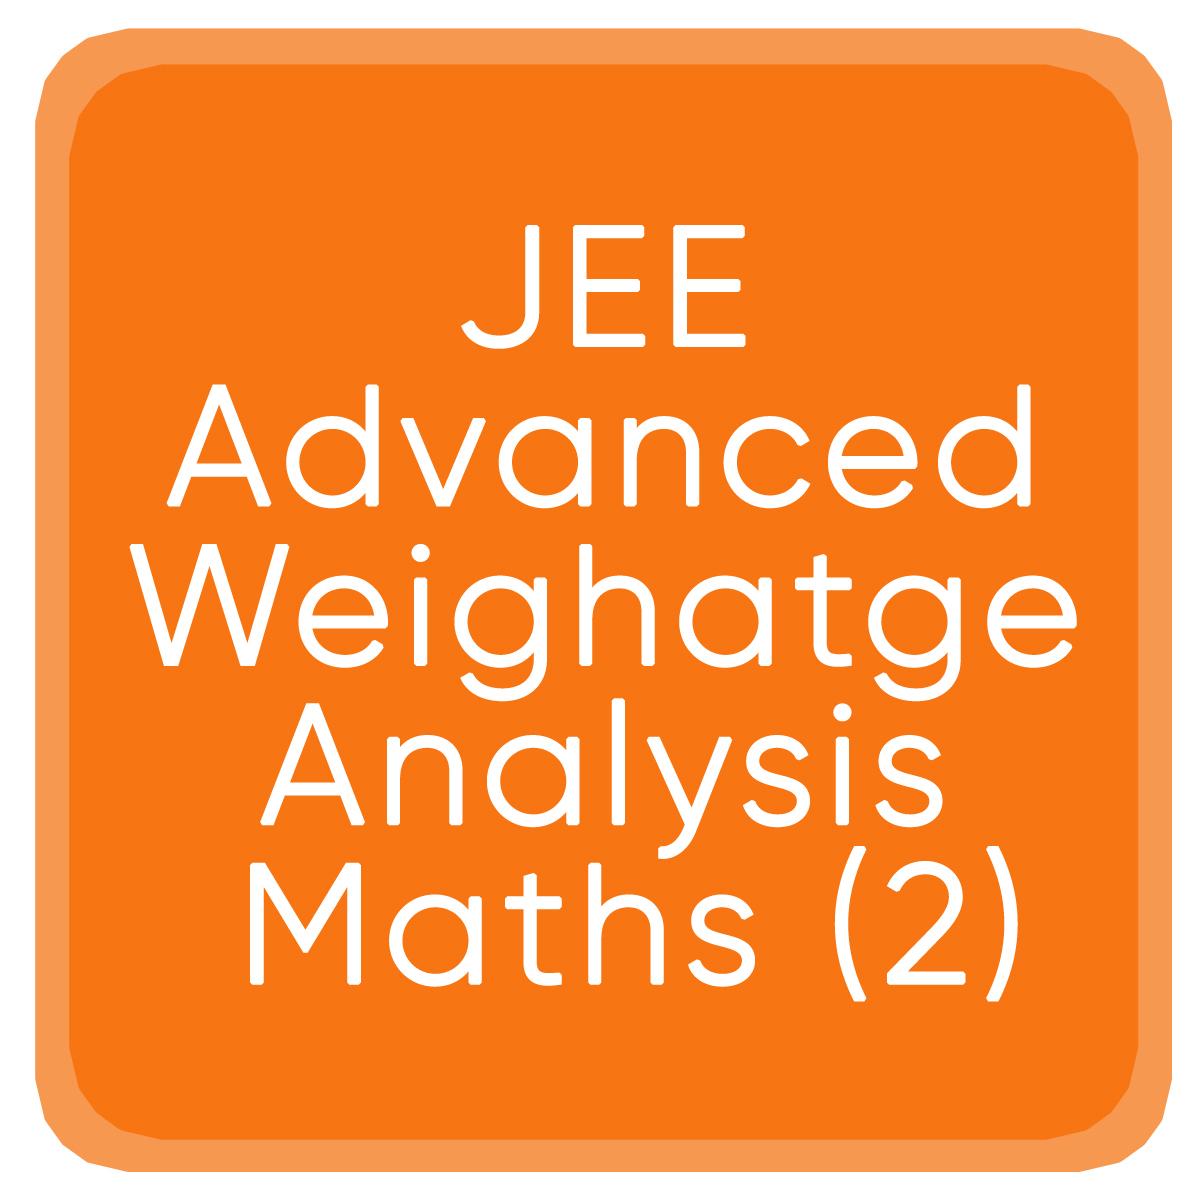 Jee Advanced Weighatge Analysis Maths (2)